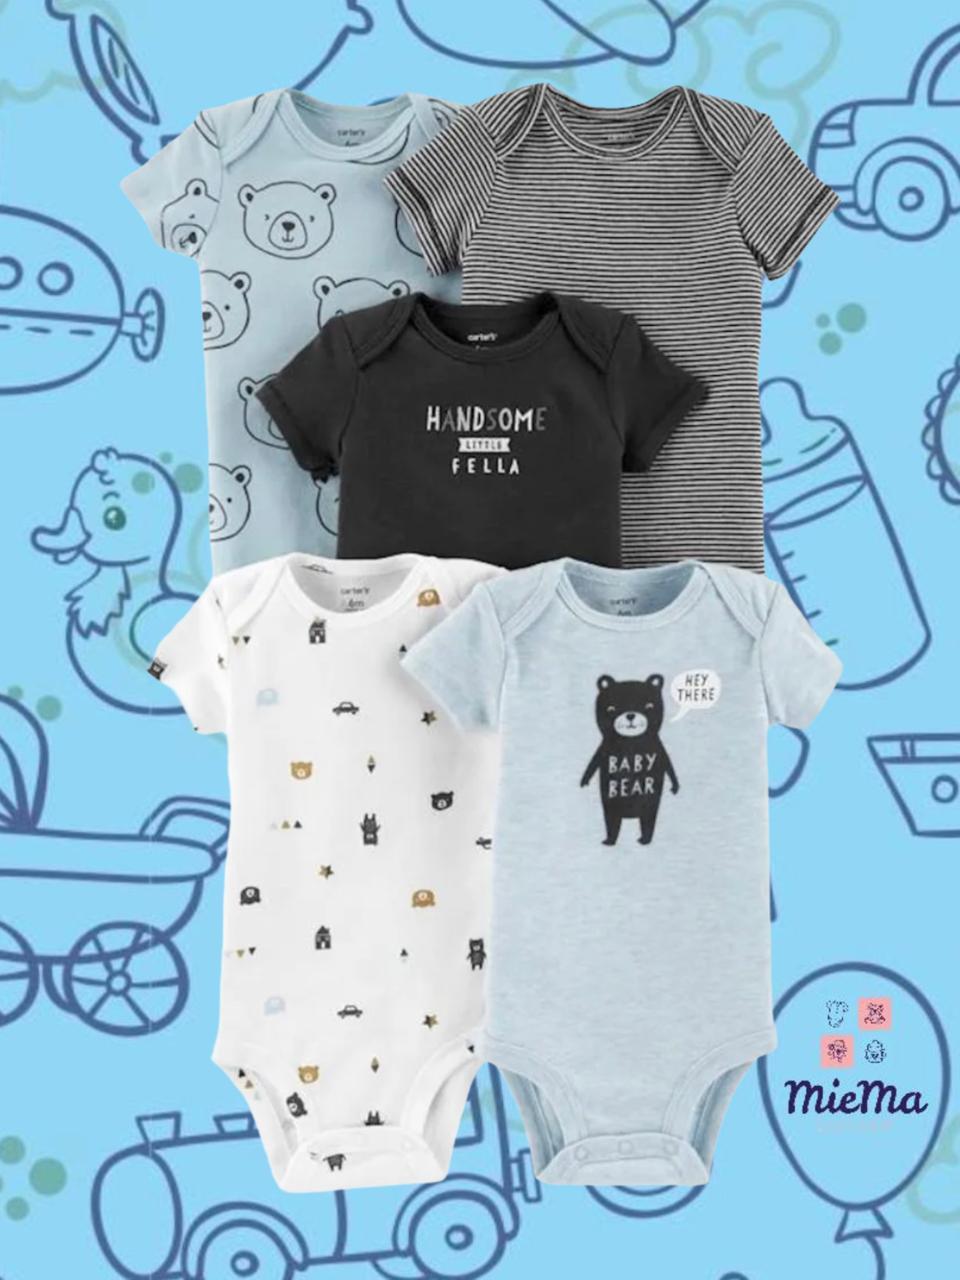 KIT 5 PEÇAS BODY MANGA CURTA CARTER'S® BABY BEAR